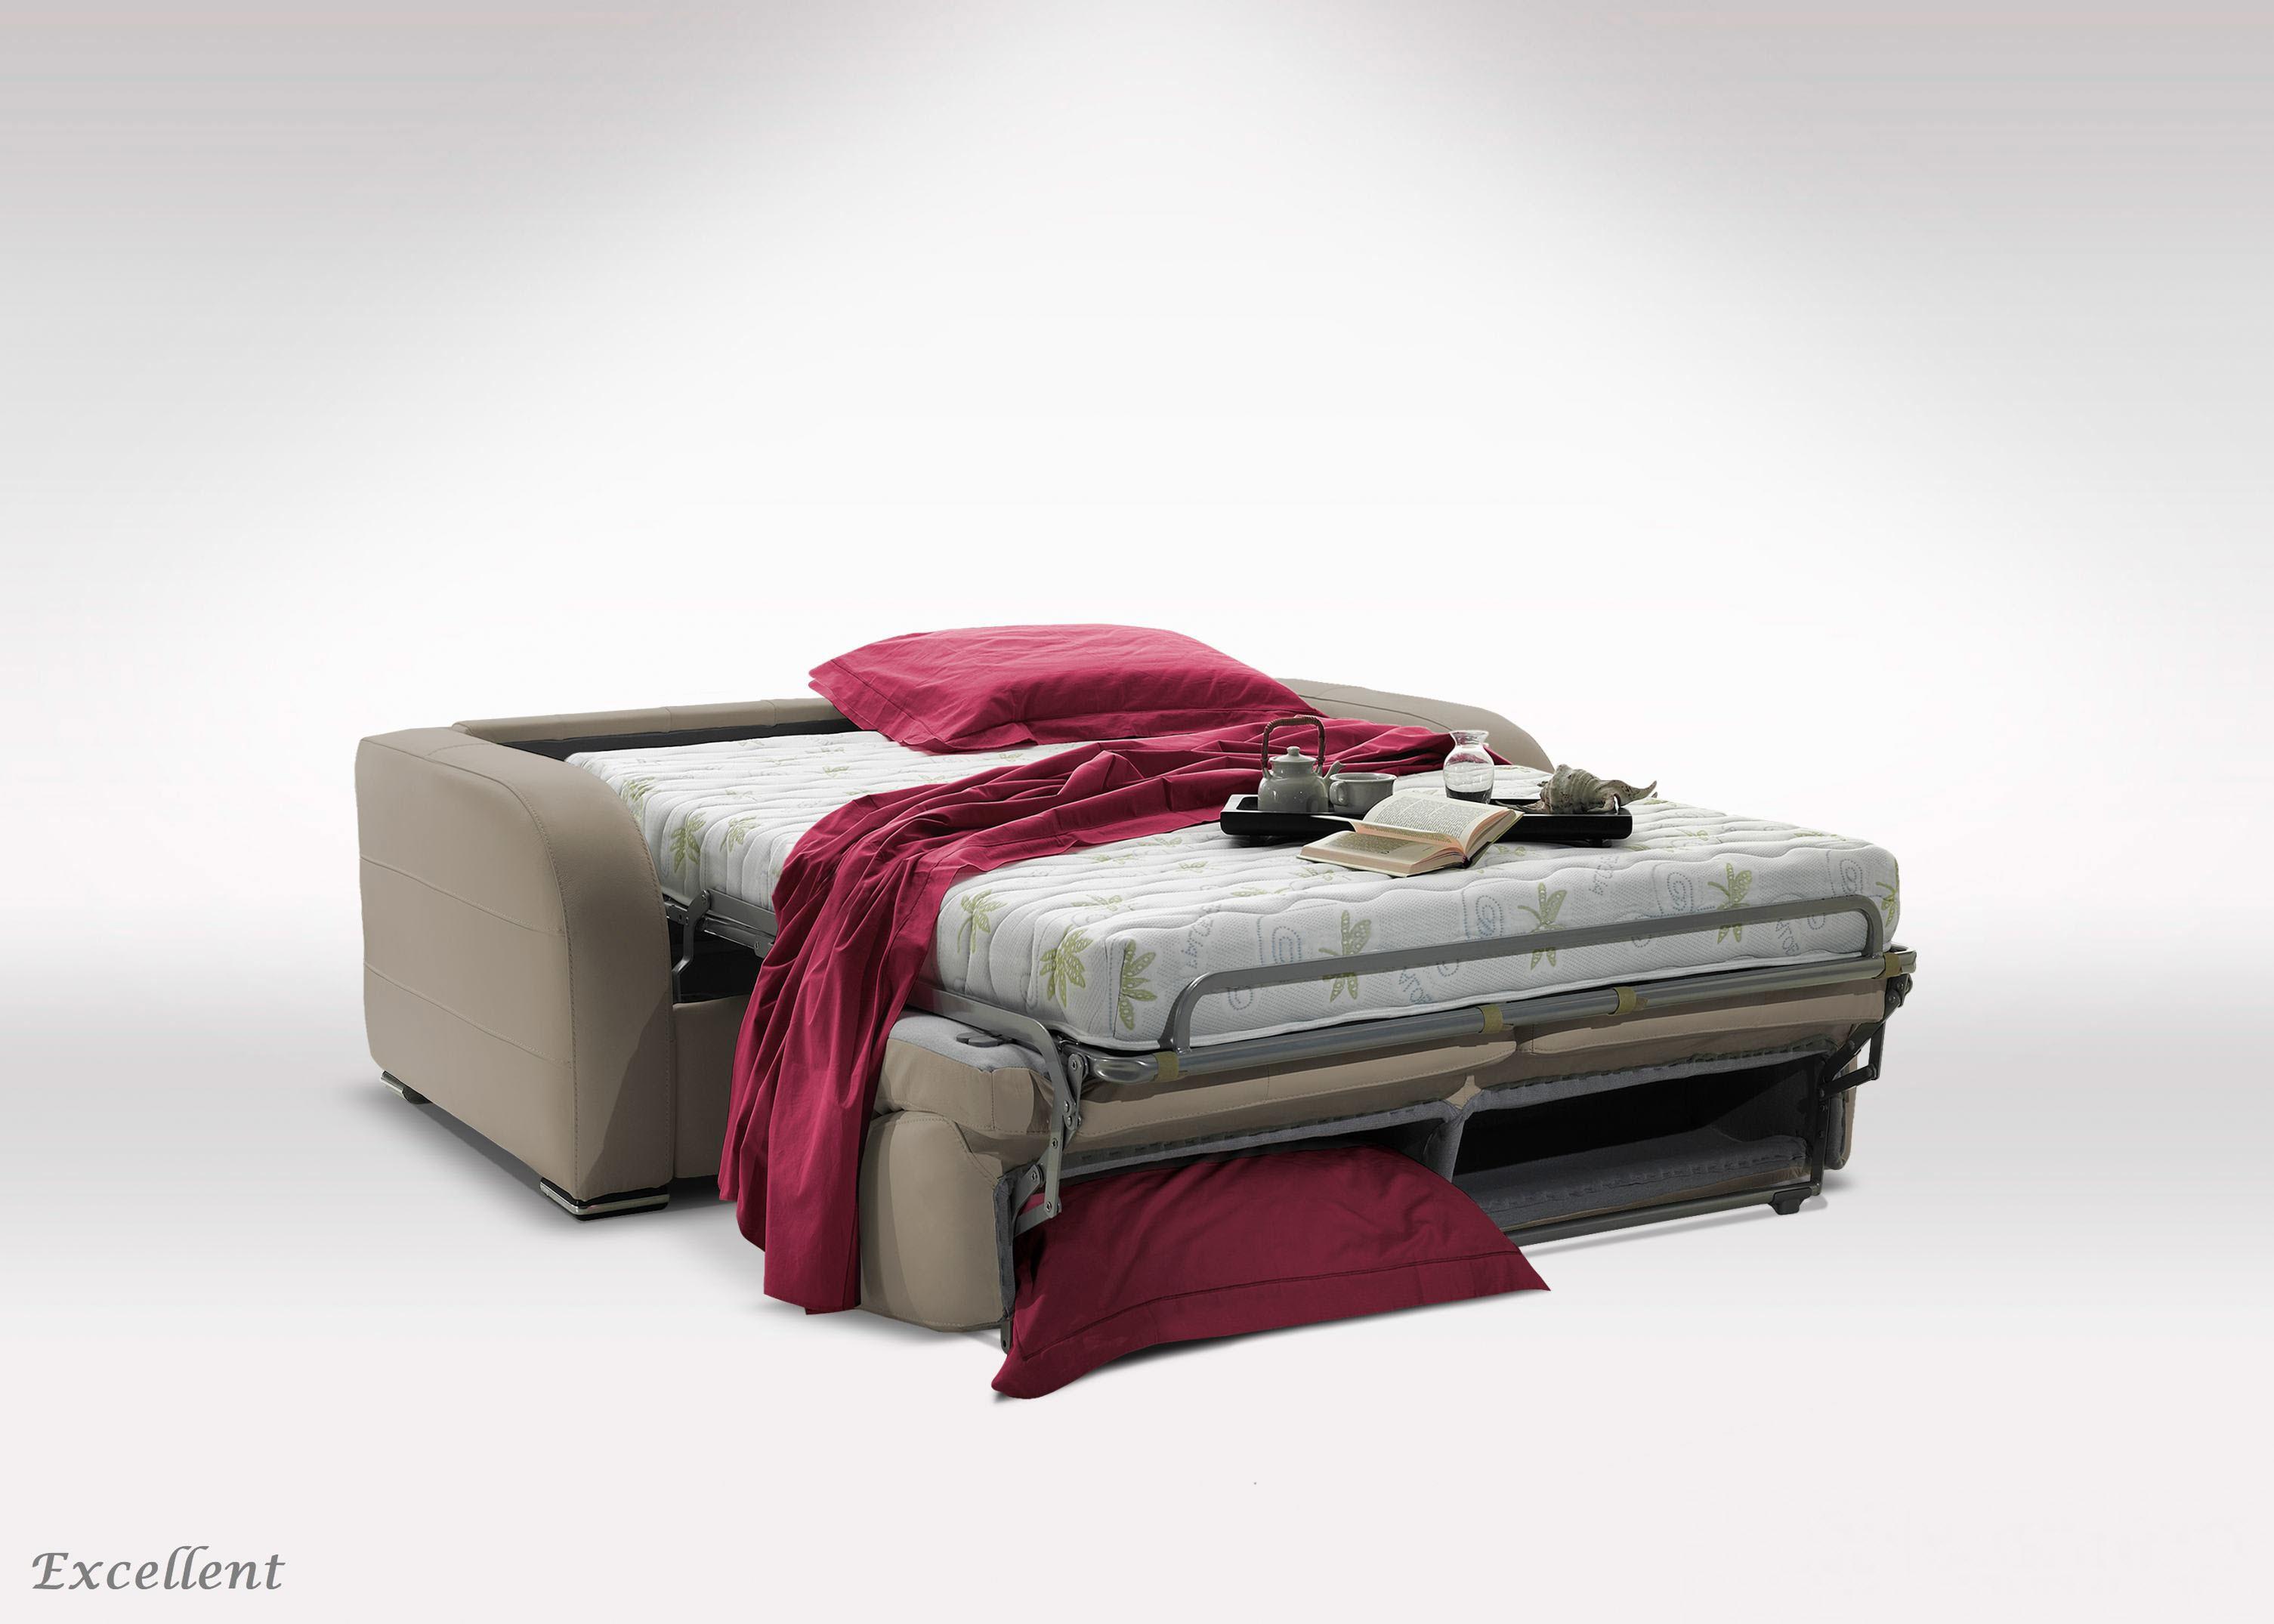 Dream ספה נפתחת למיטה